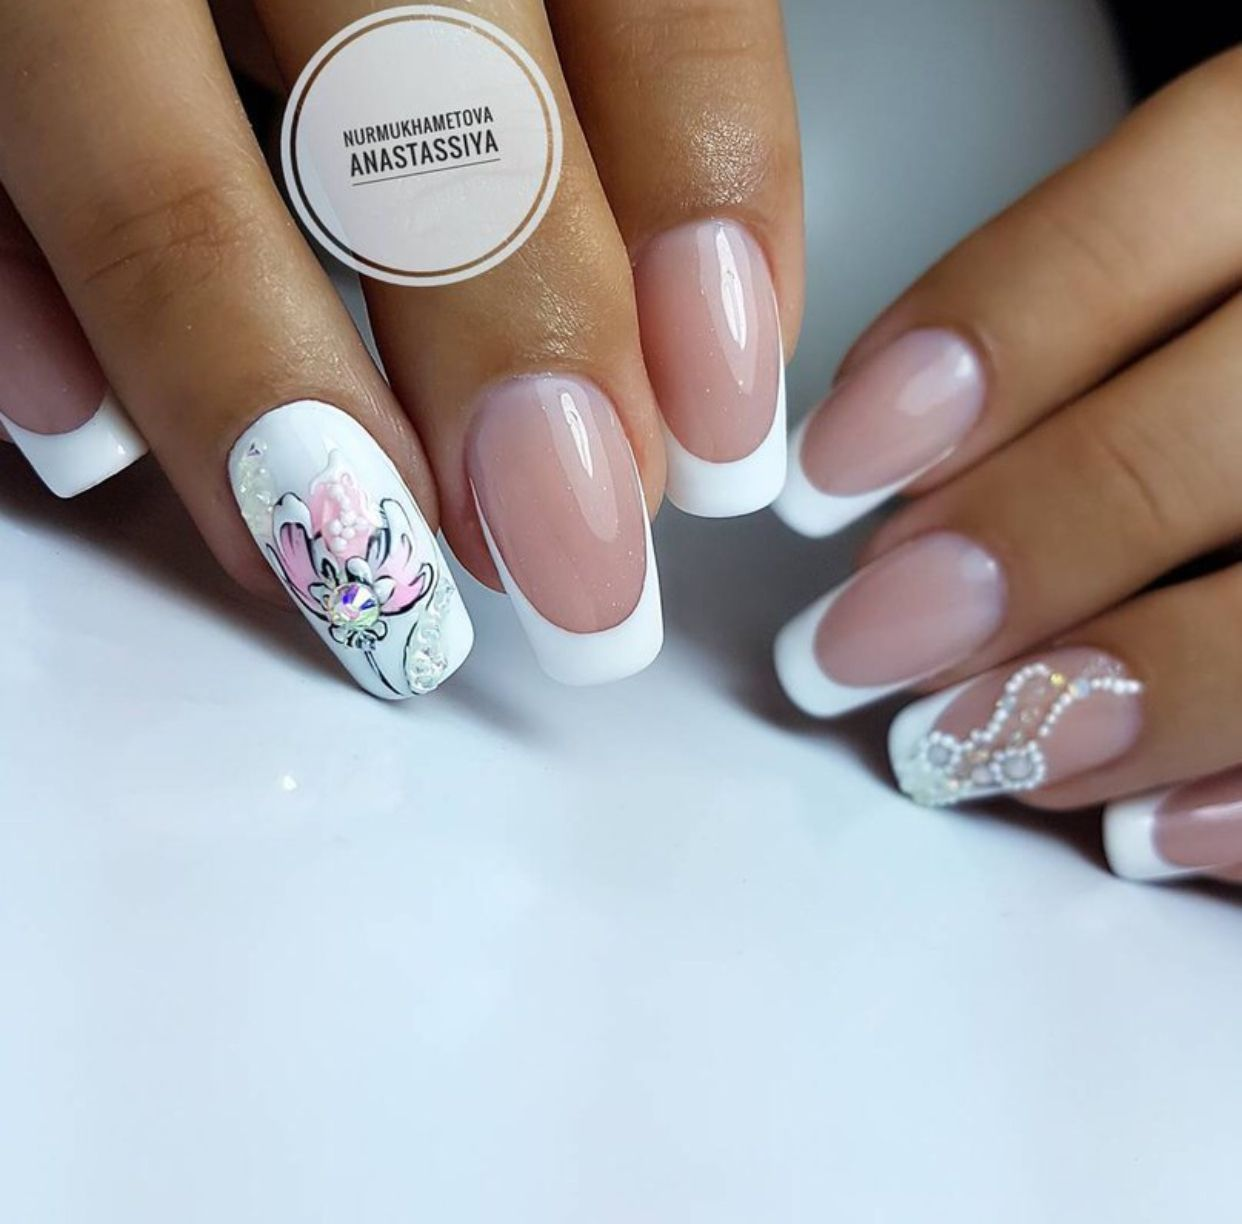 Pin by Оксана Гринева on ногти | Pinterest | Short nails art, Square ...